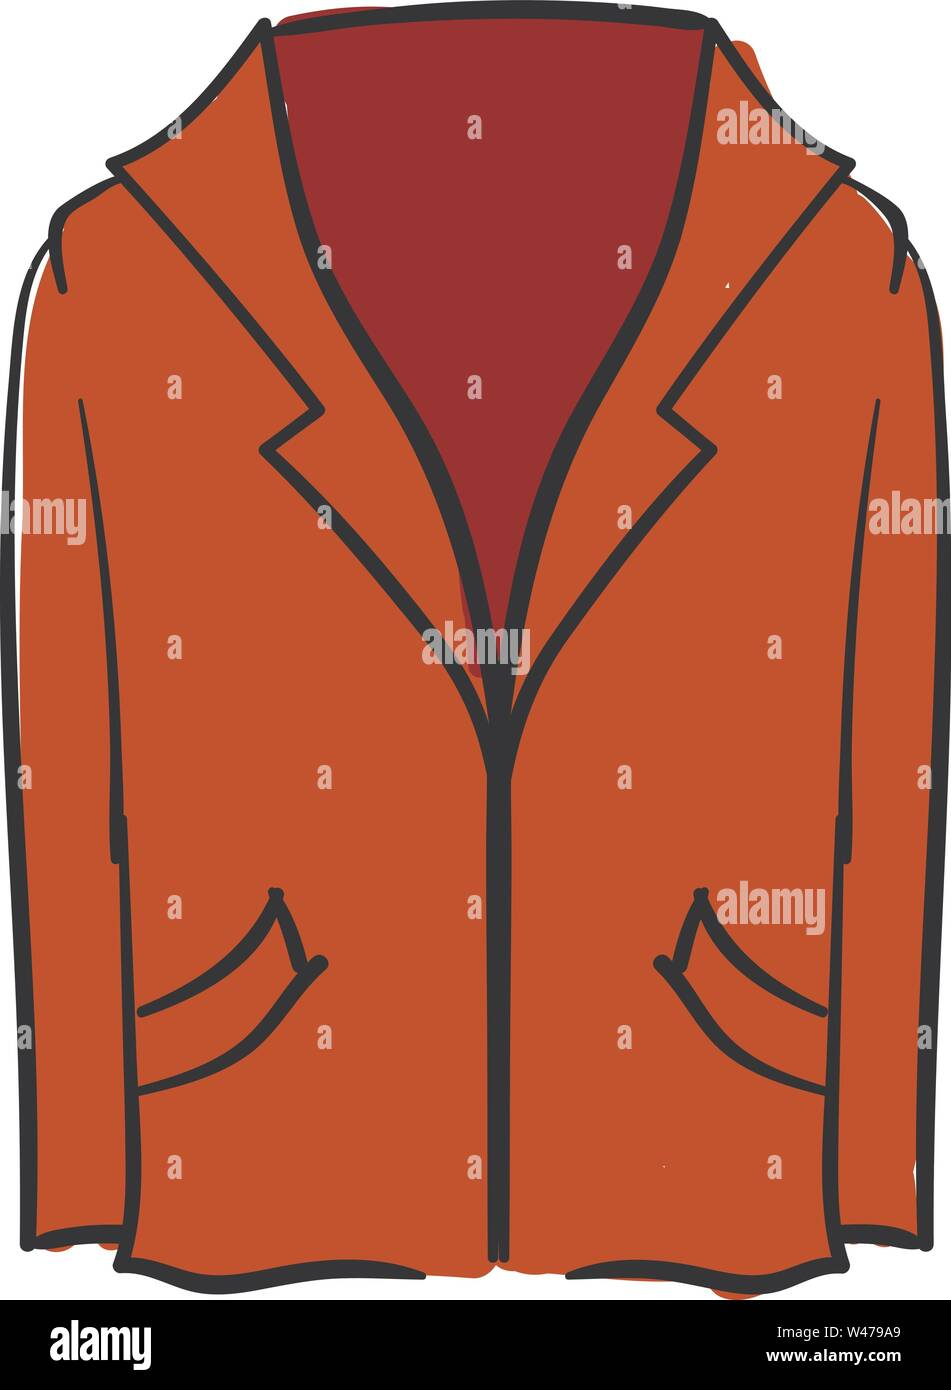 Red blazer, illustration, vector on white background. - Stock Image